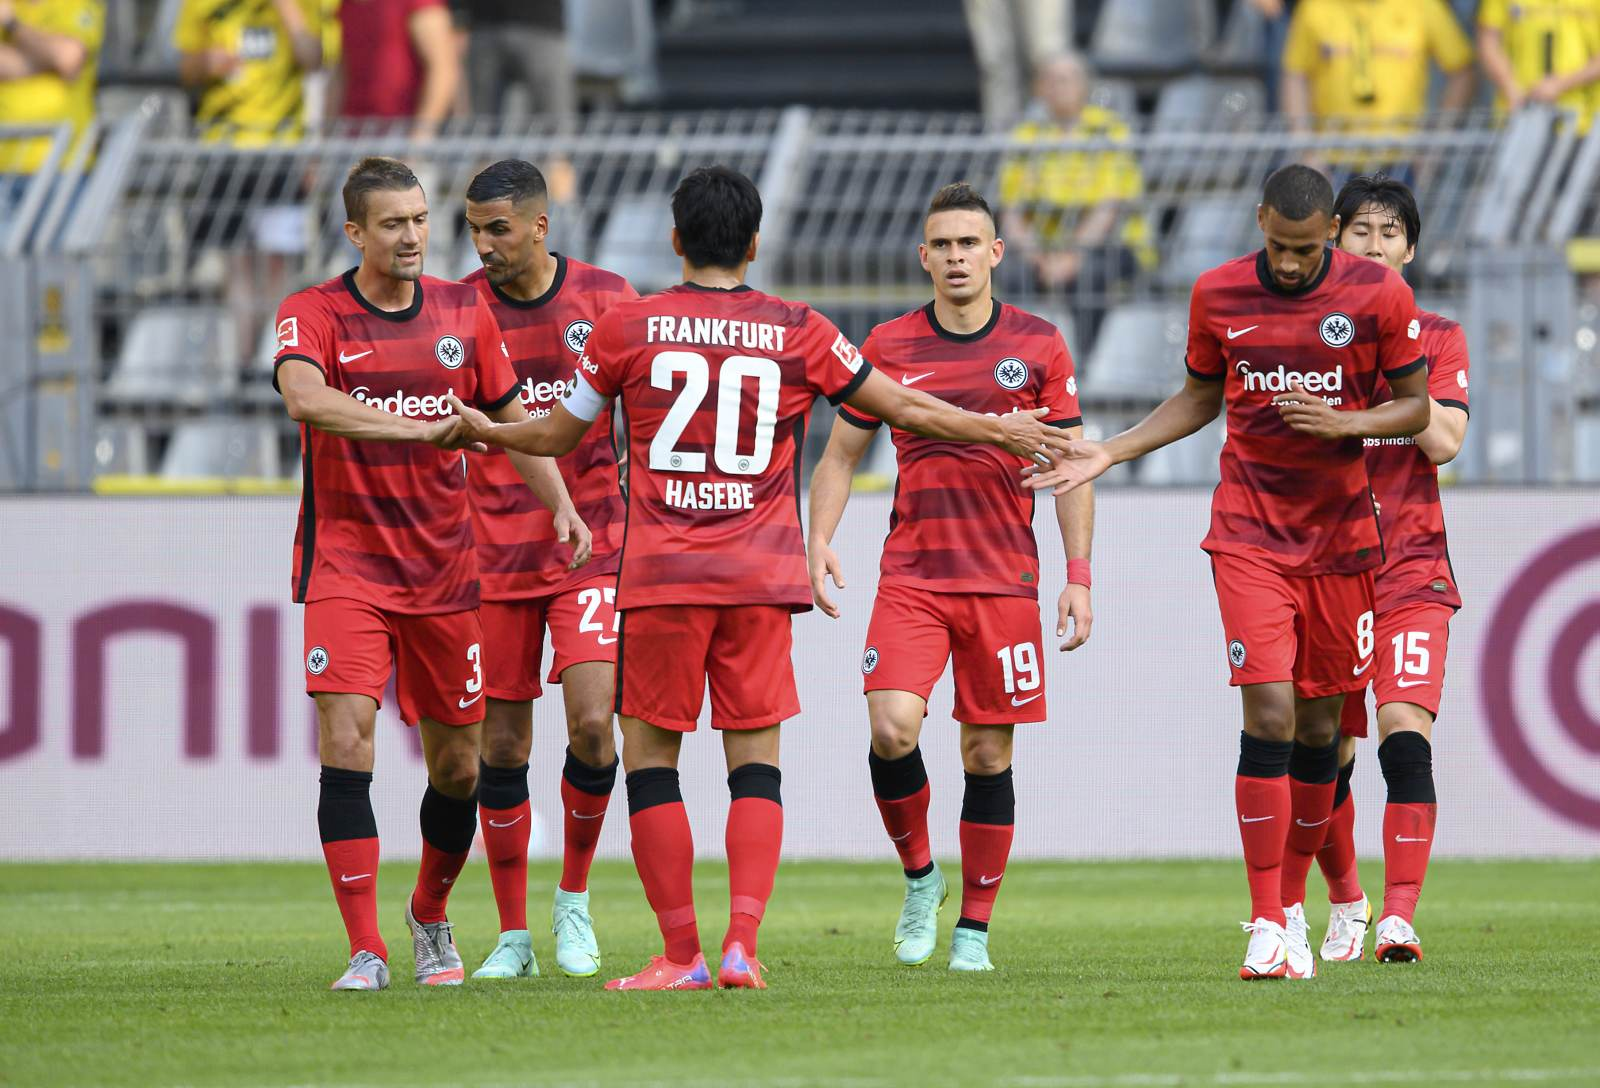 «Бохум» - «Айнтрахт»: прогноз на матч чемпионата Германии - 24 октября 2021